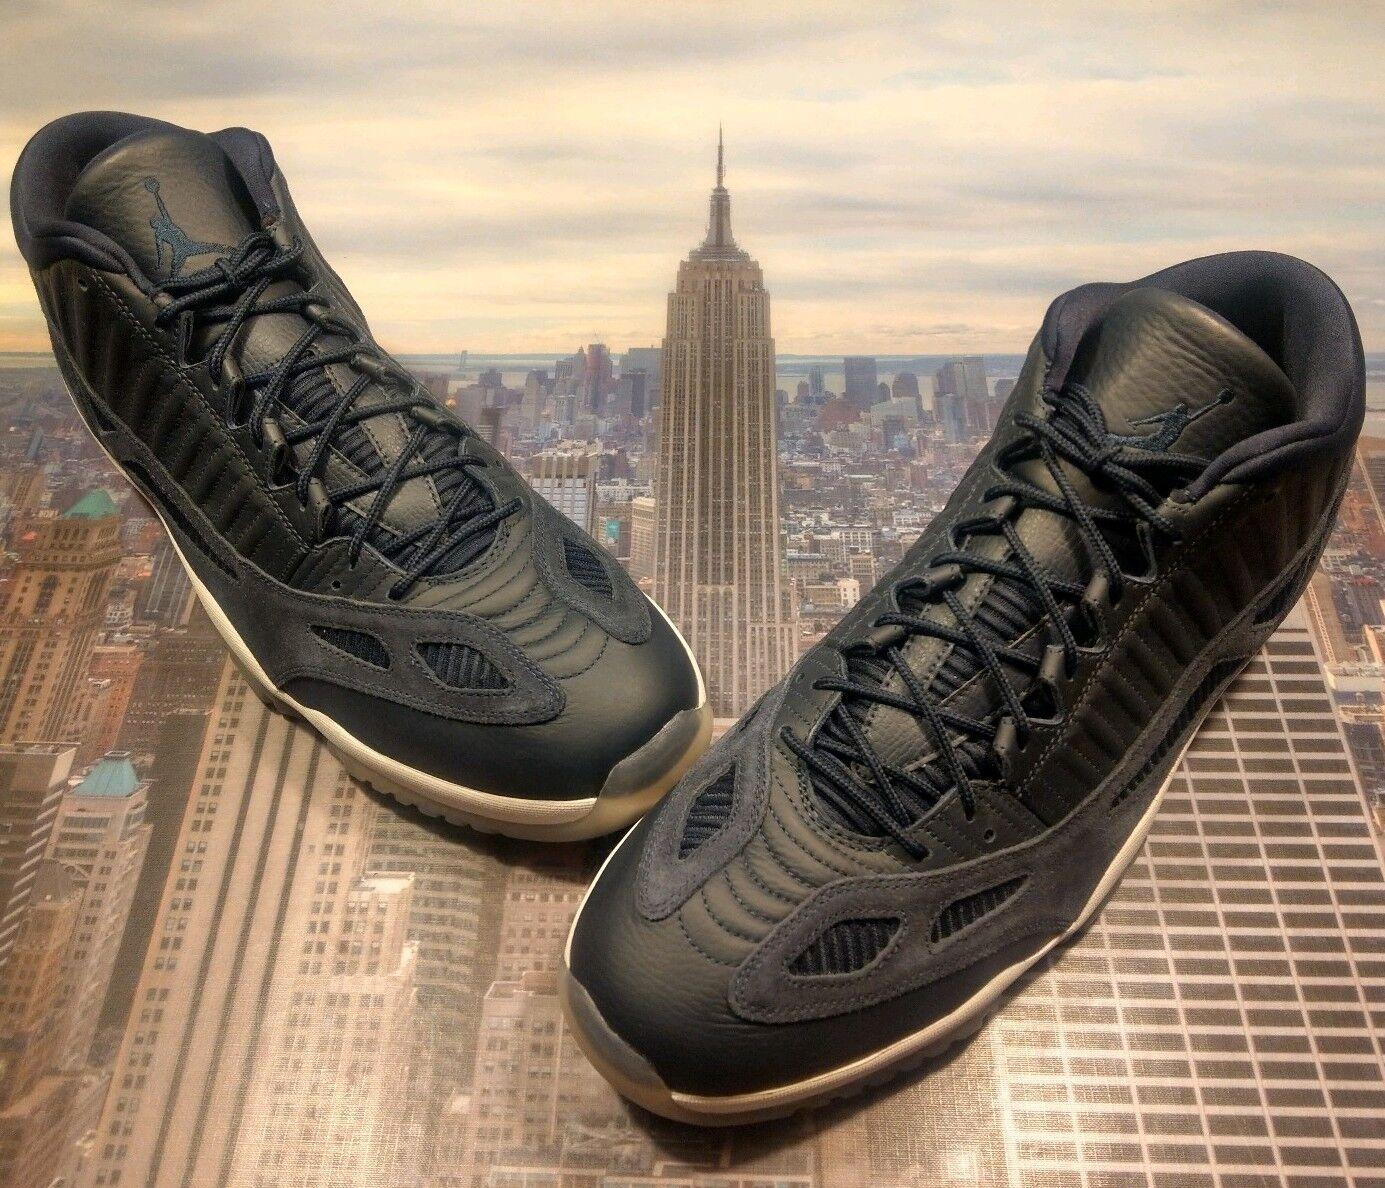 Nike Air Jordan XI 11 Retro Low IE Obsidian White Mens Size 18 919712 400 New